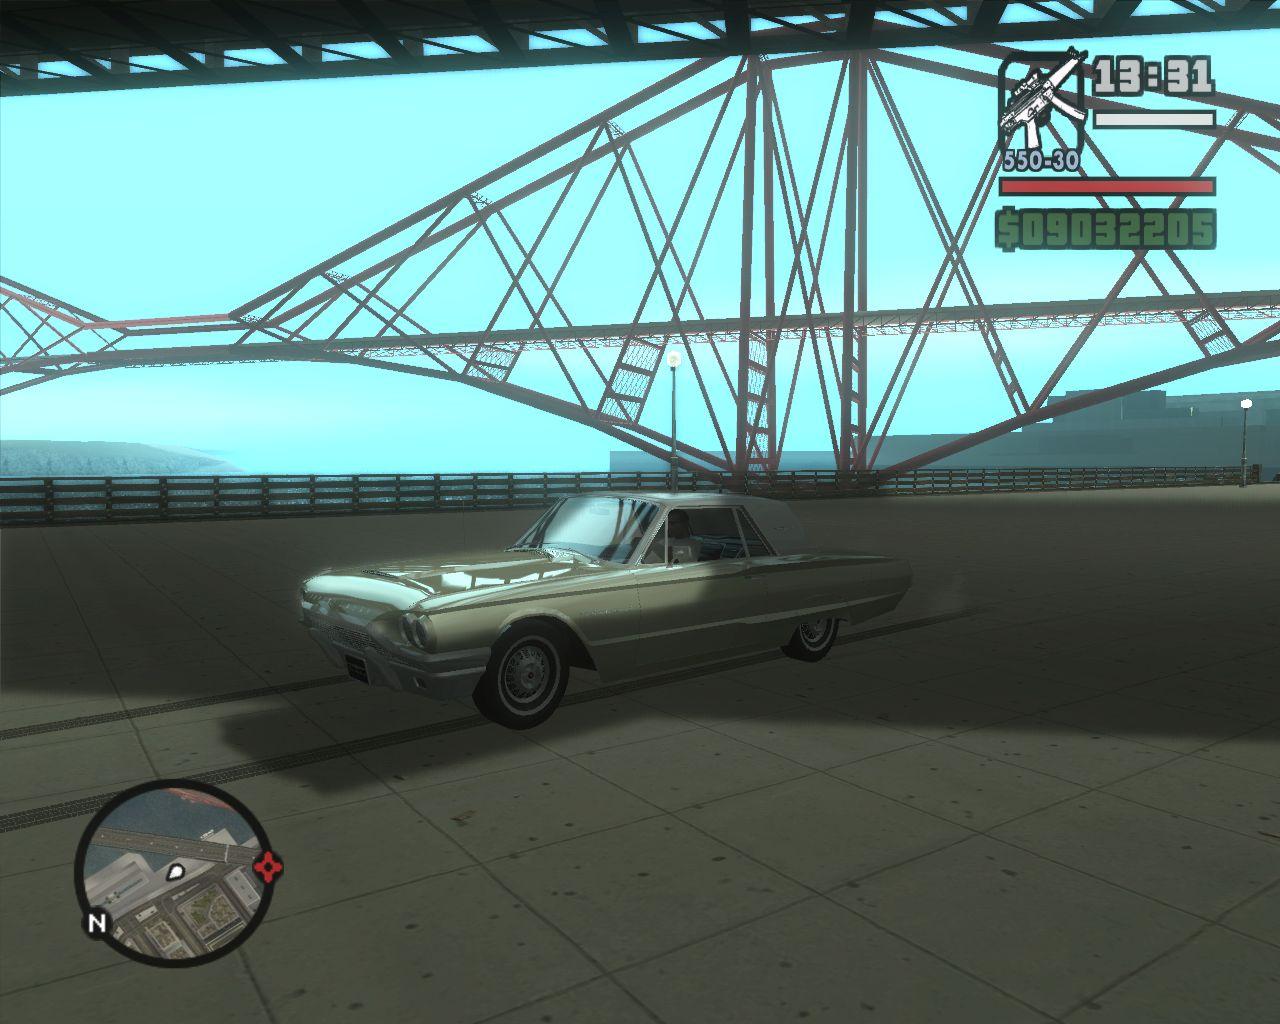 gta_sa 2008-04-19 12-12-38-81.jpg - Grand Theft Auto: San Andreas